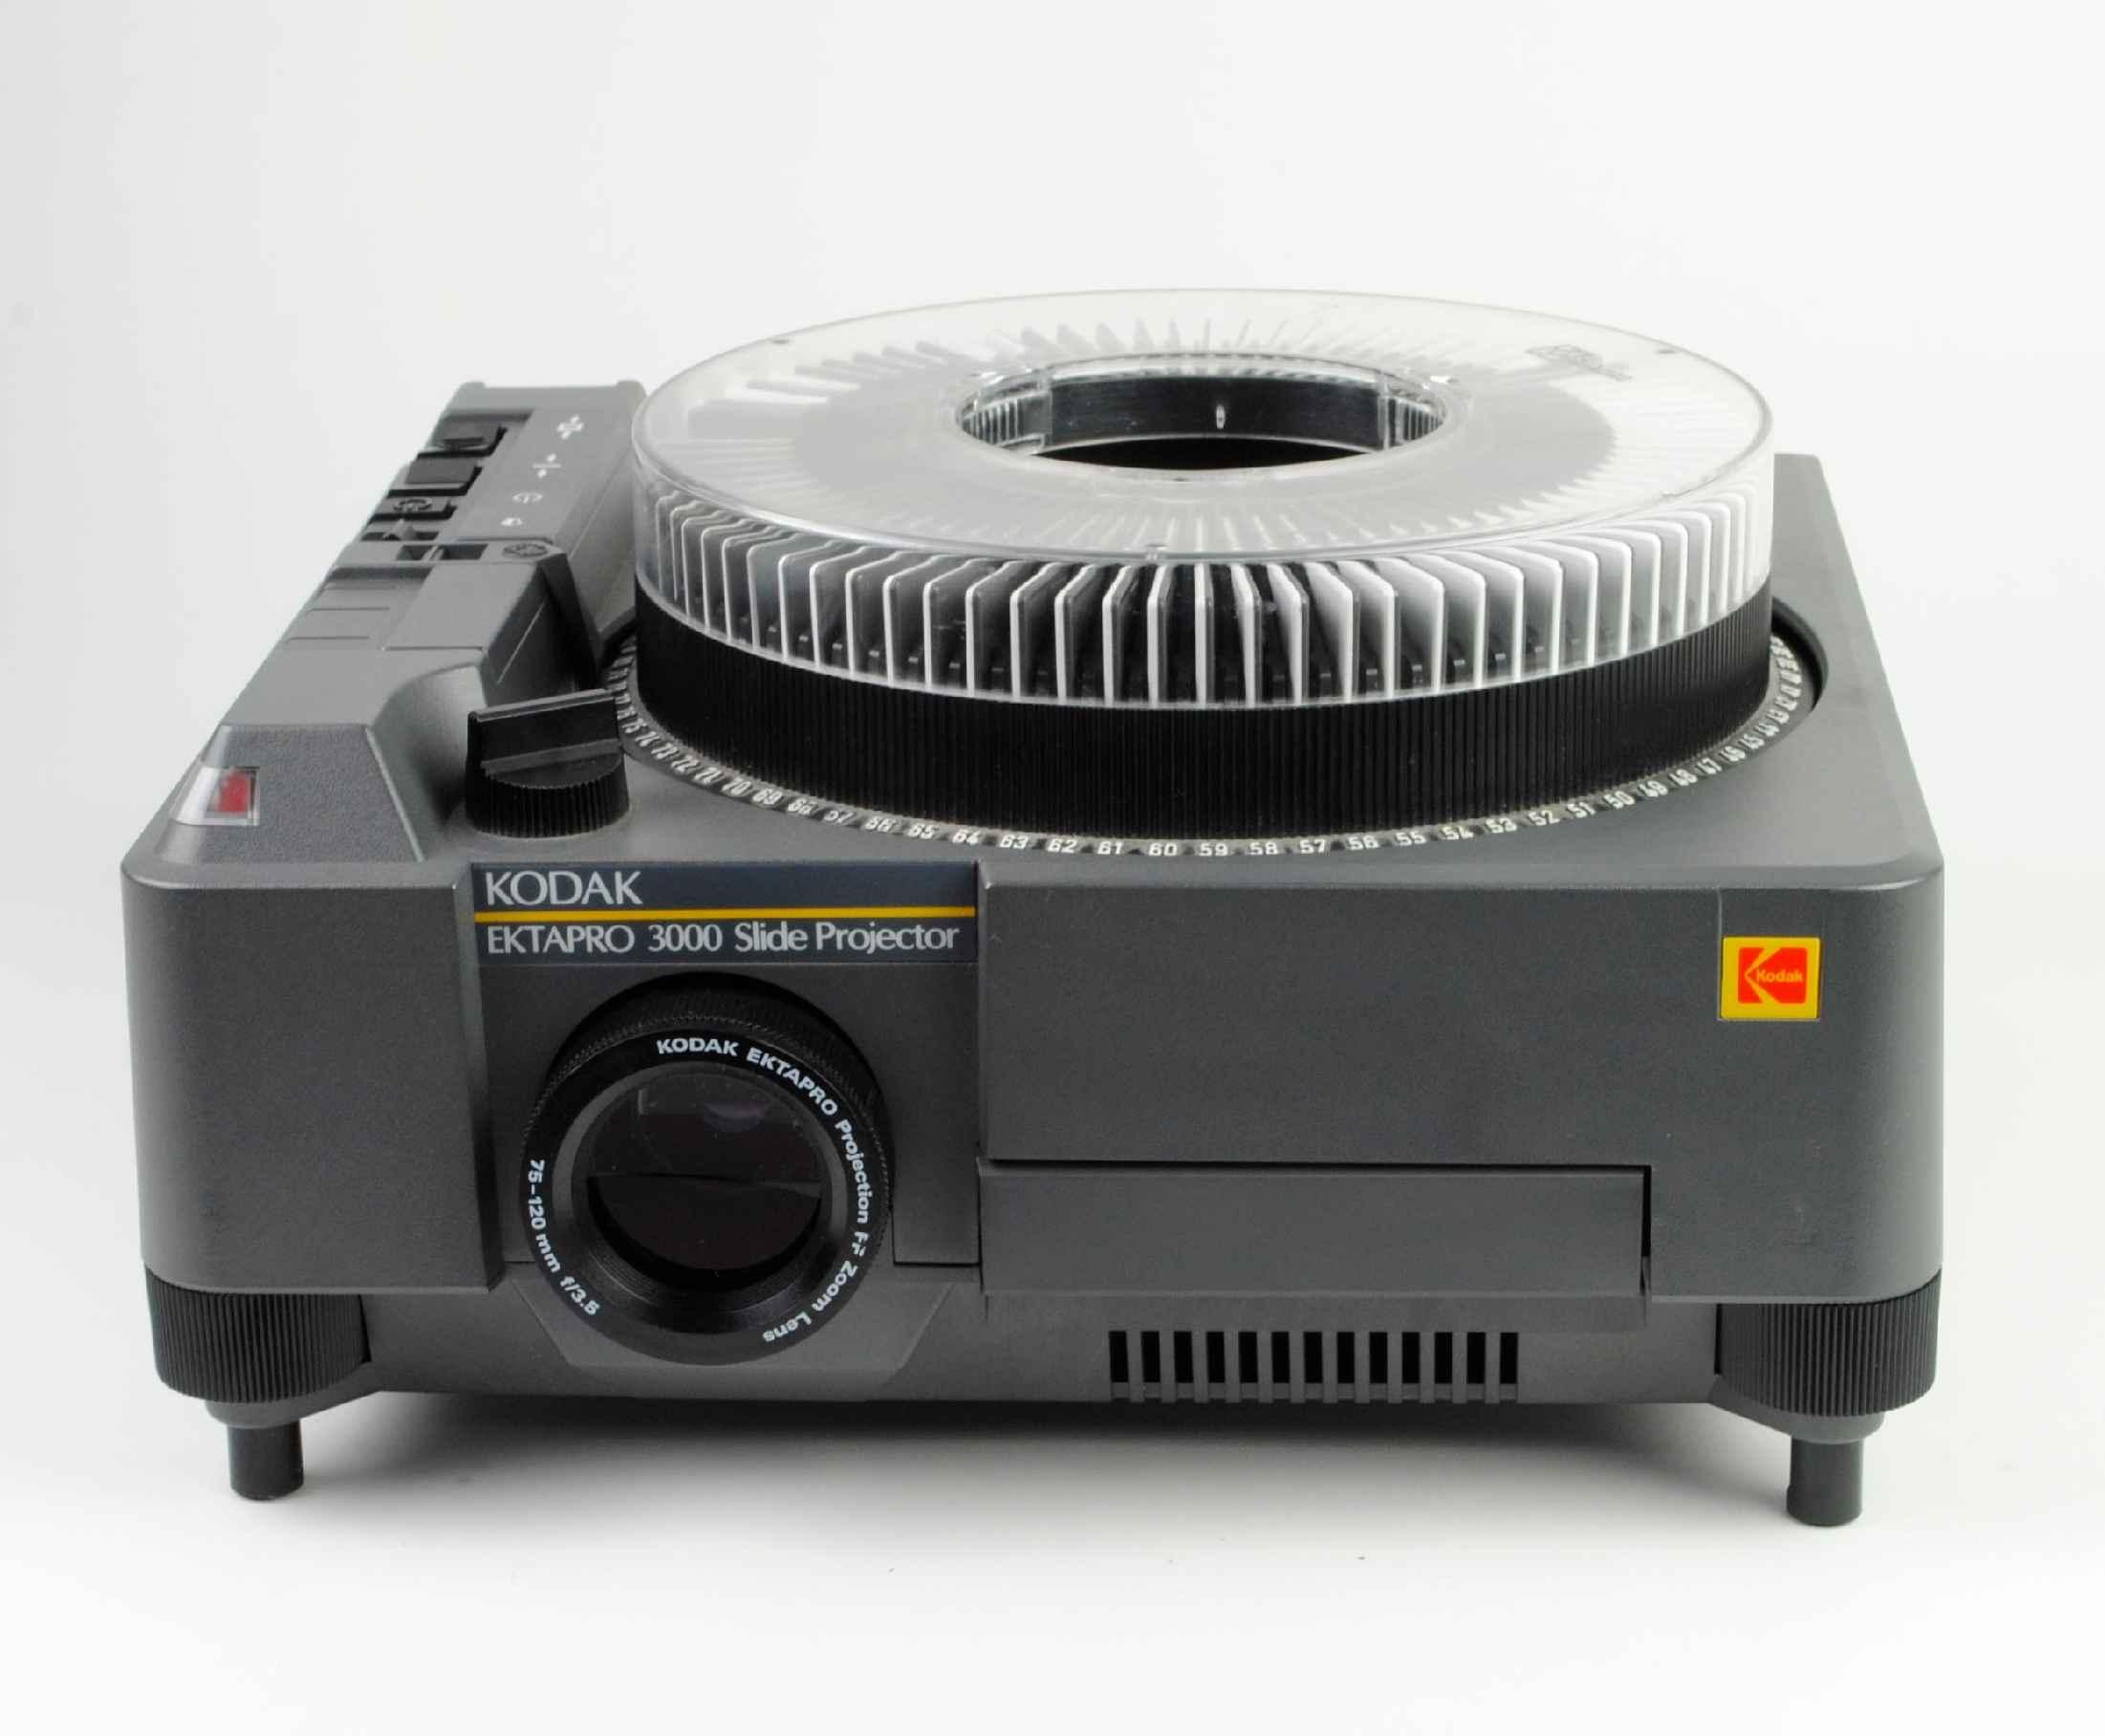 kodak ektapro 3000 slide projectors spare parts and information rh van eck net Tractor Service Manuals Tractor Service Manuals